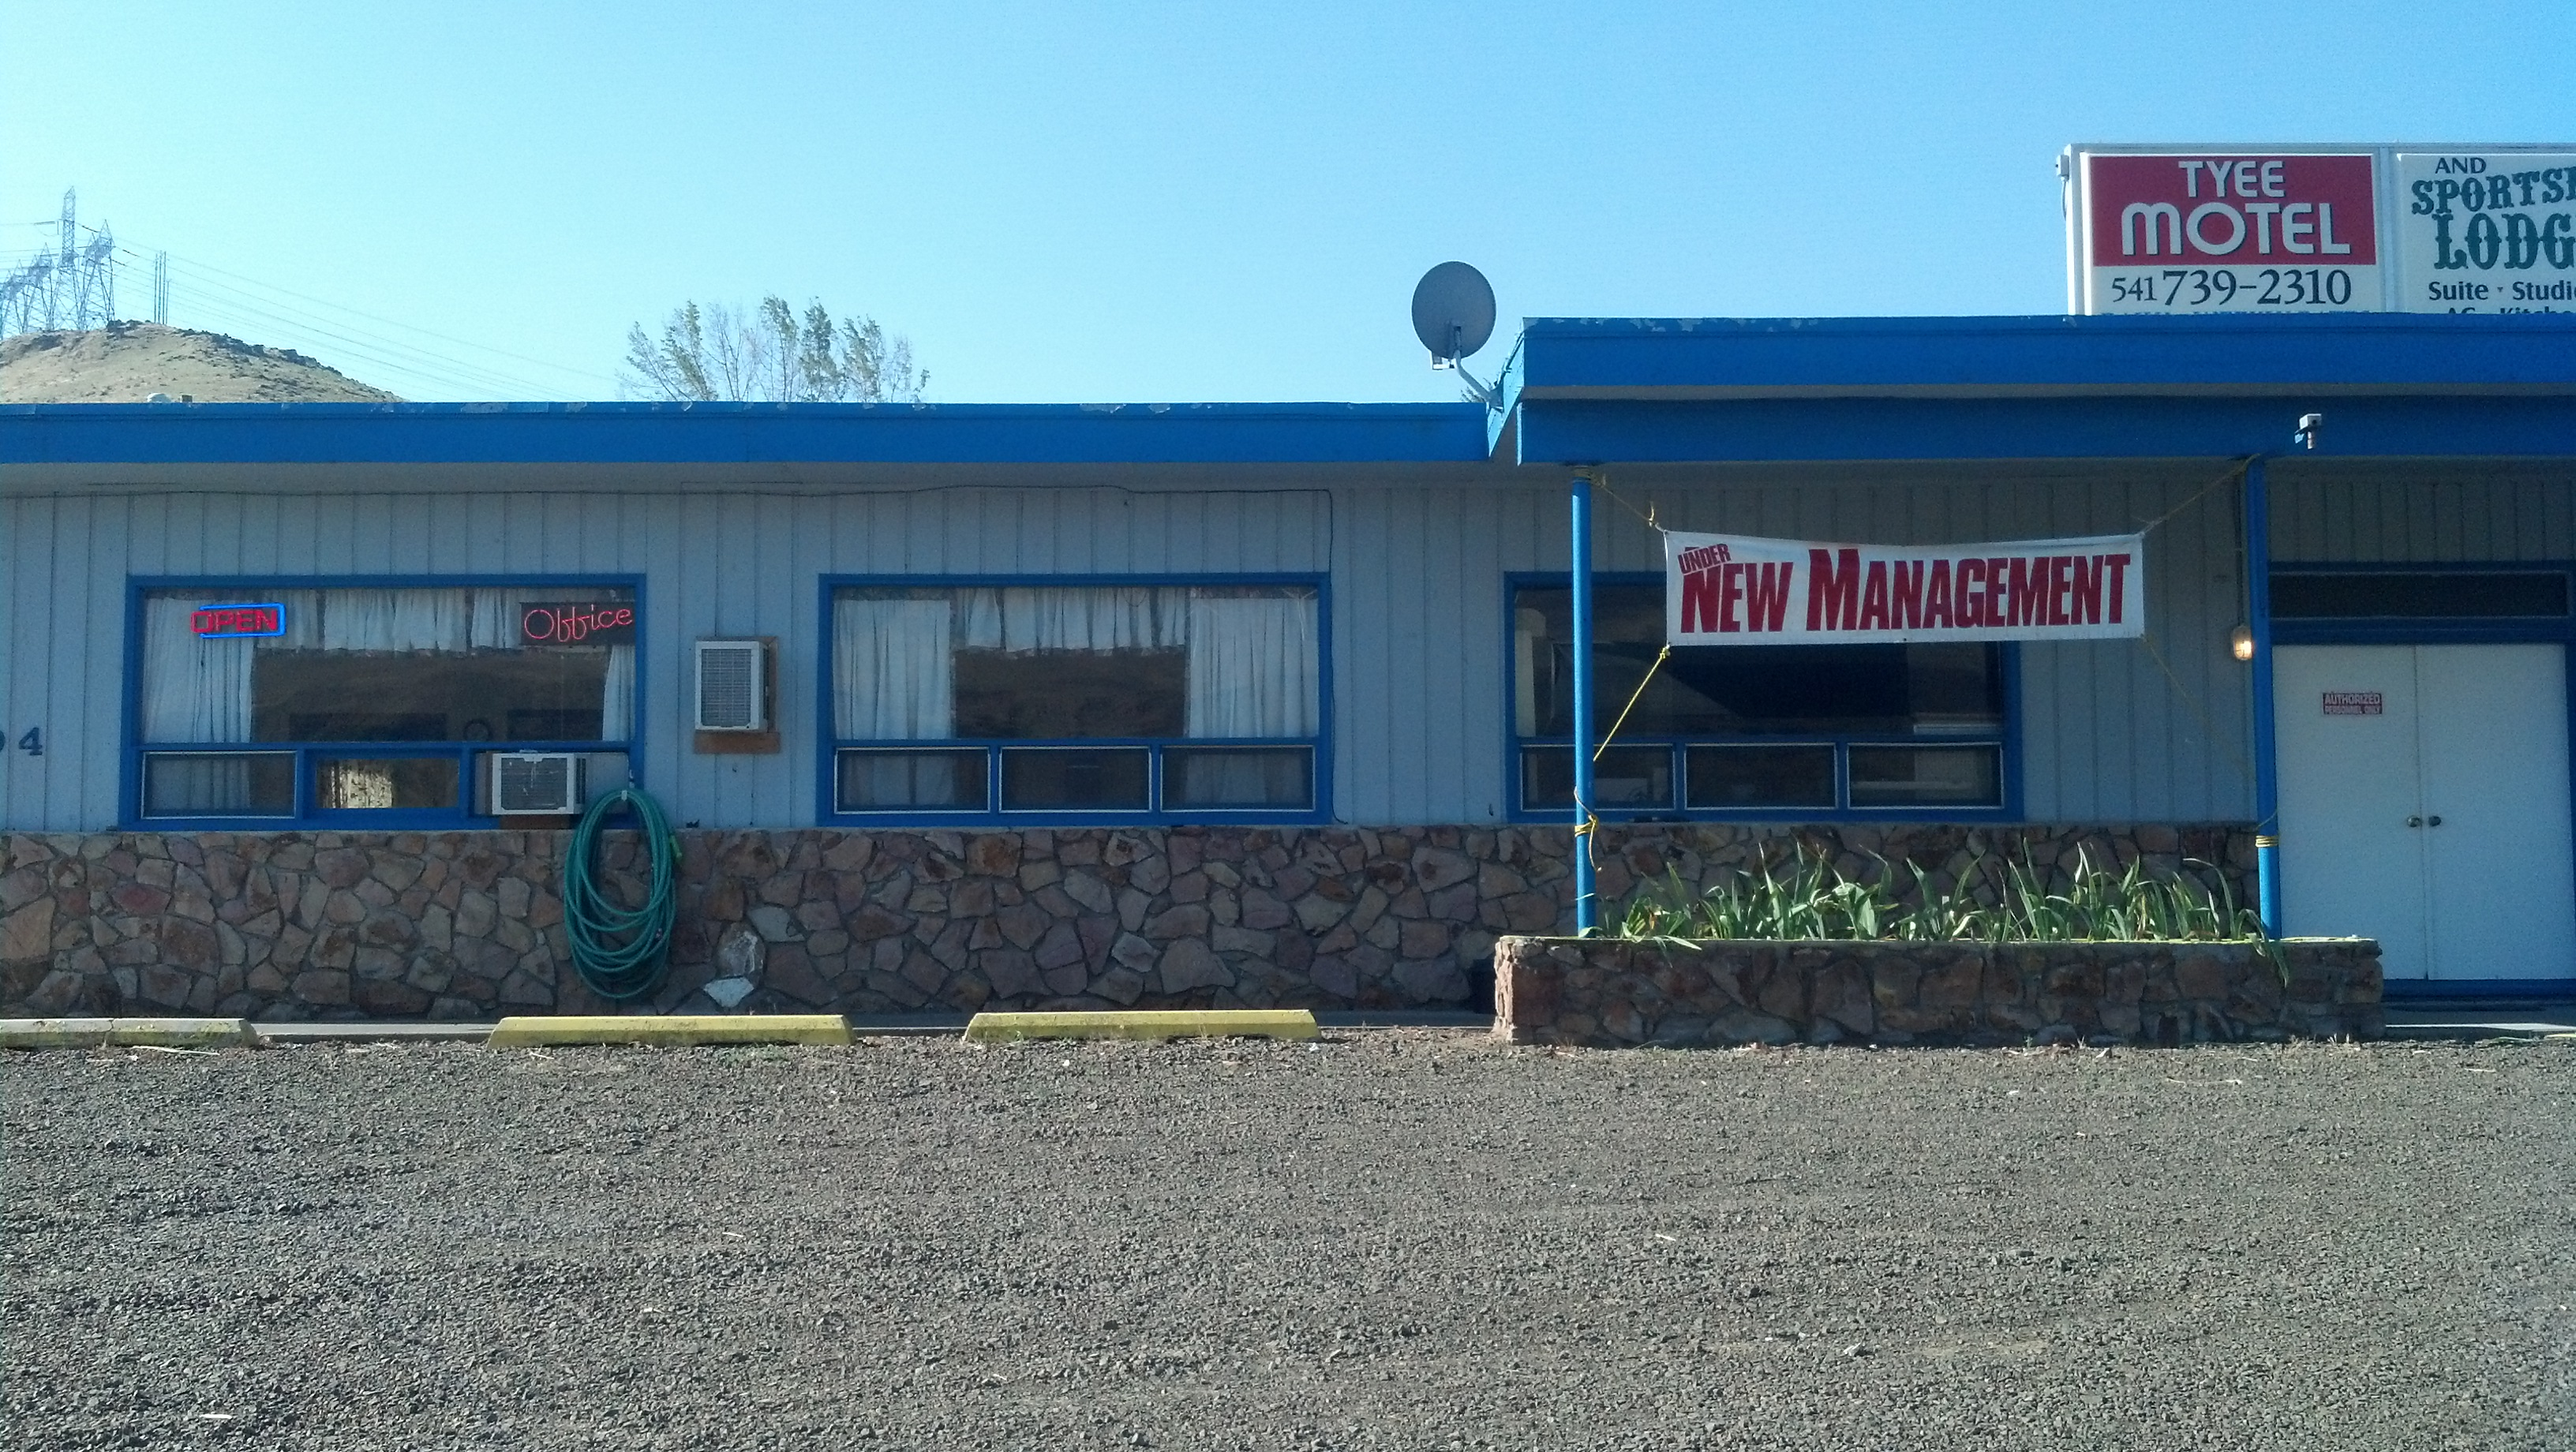 Tyee Motel